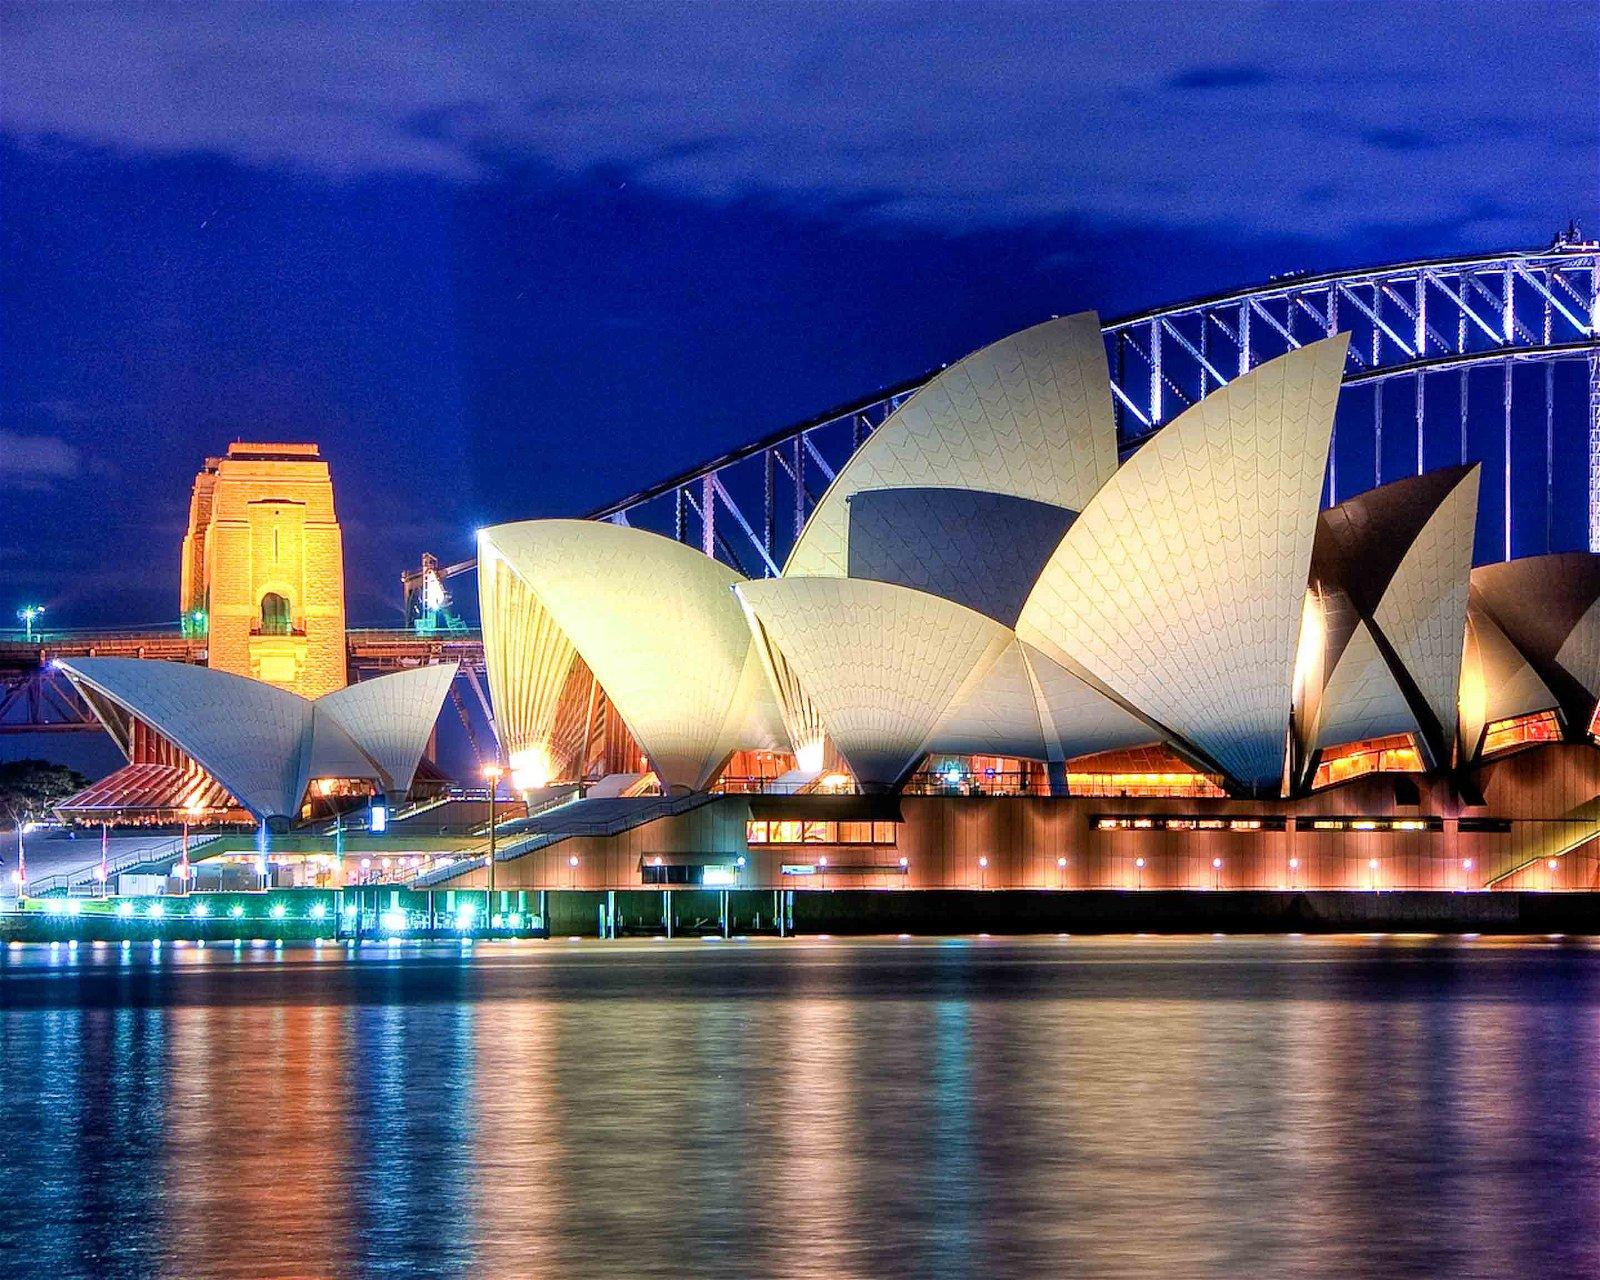 Sydney Opera House in Australia